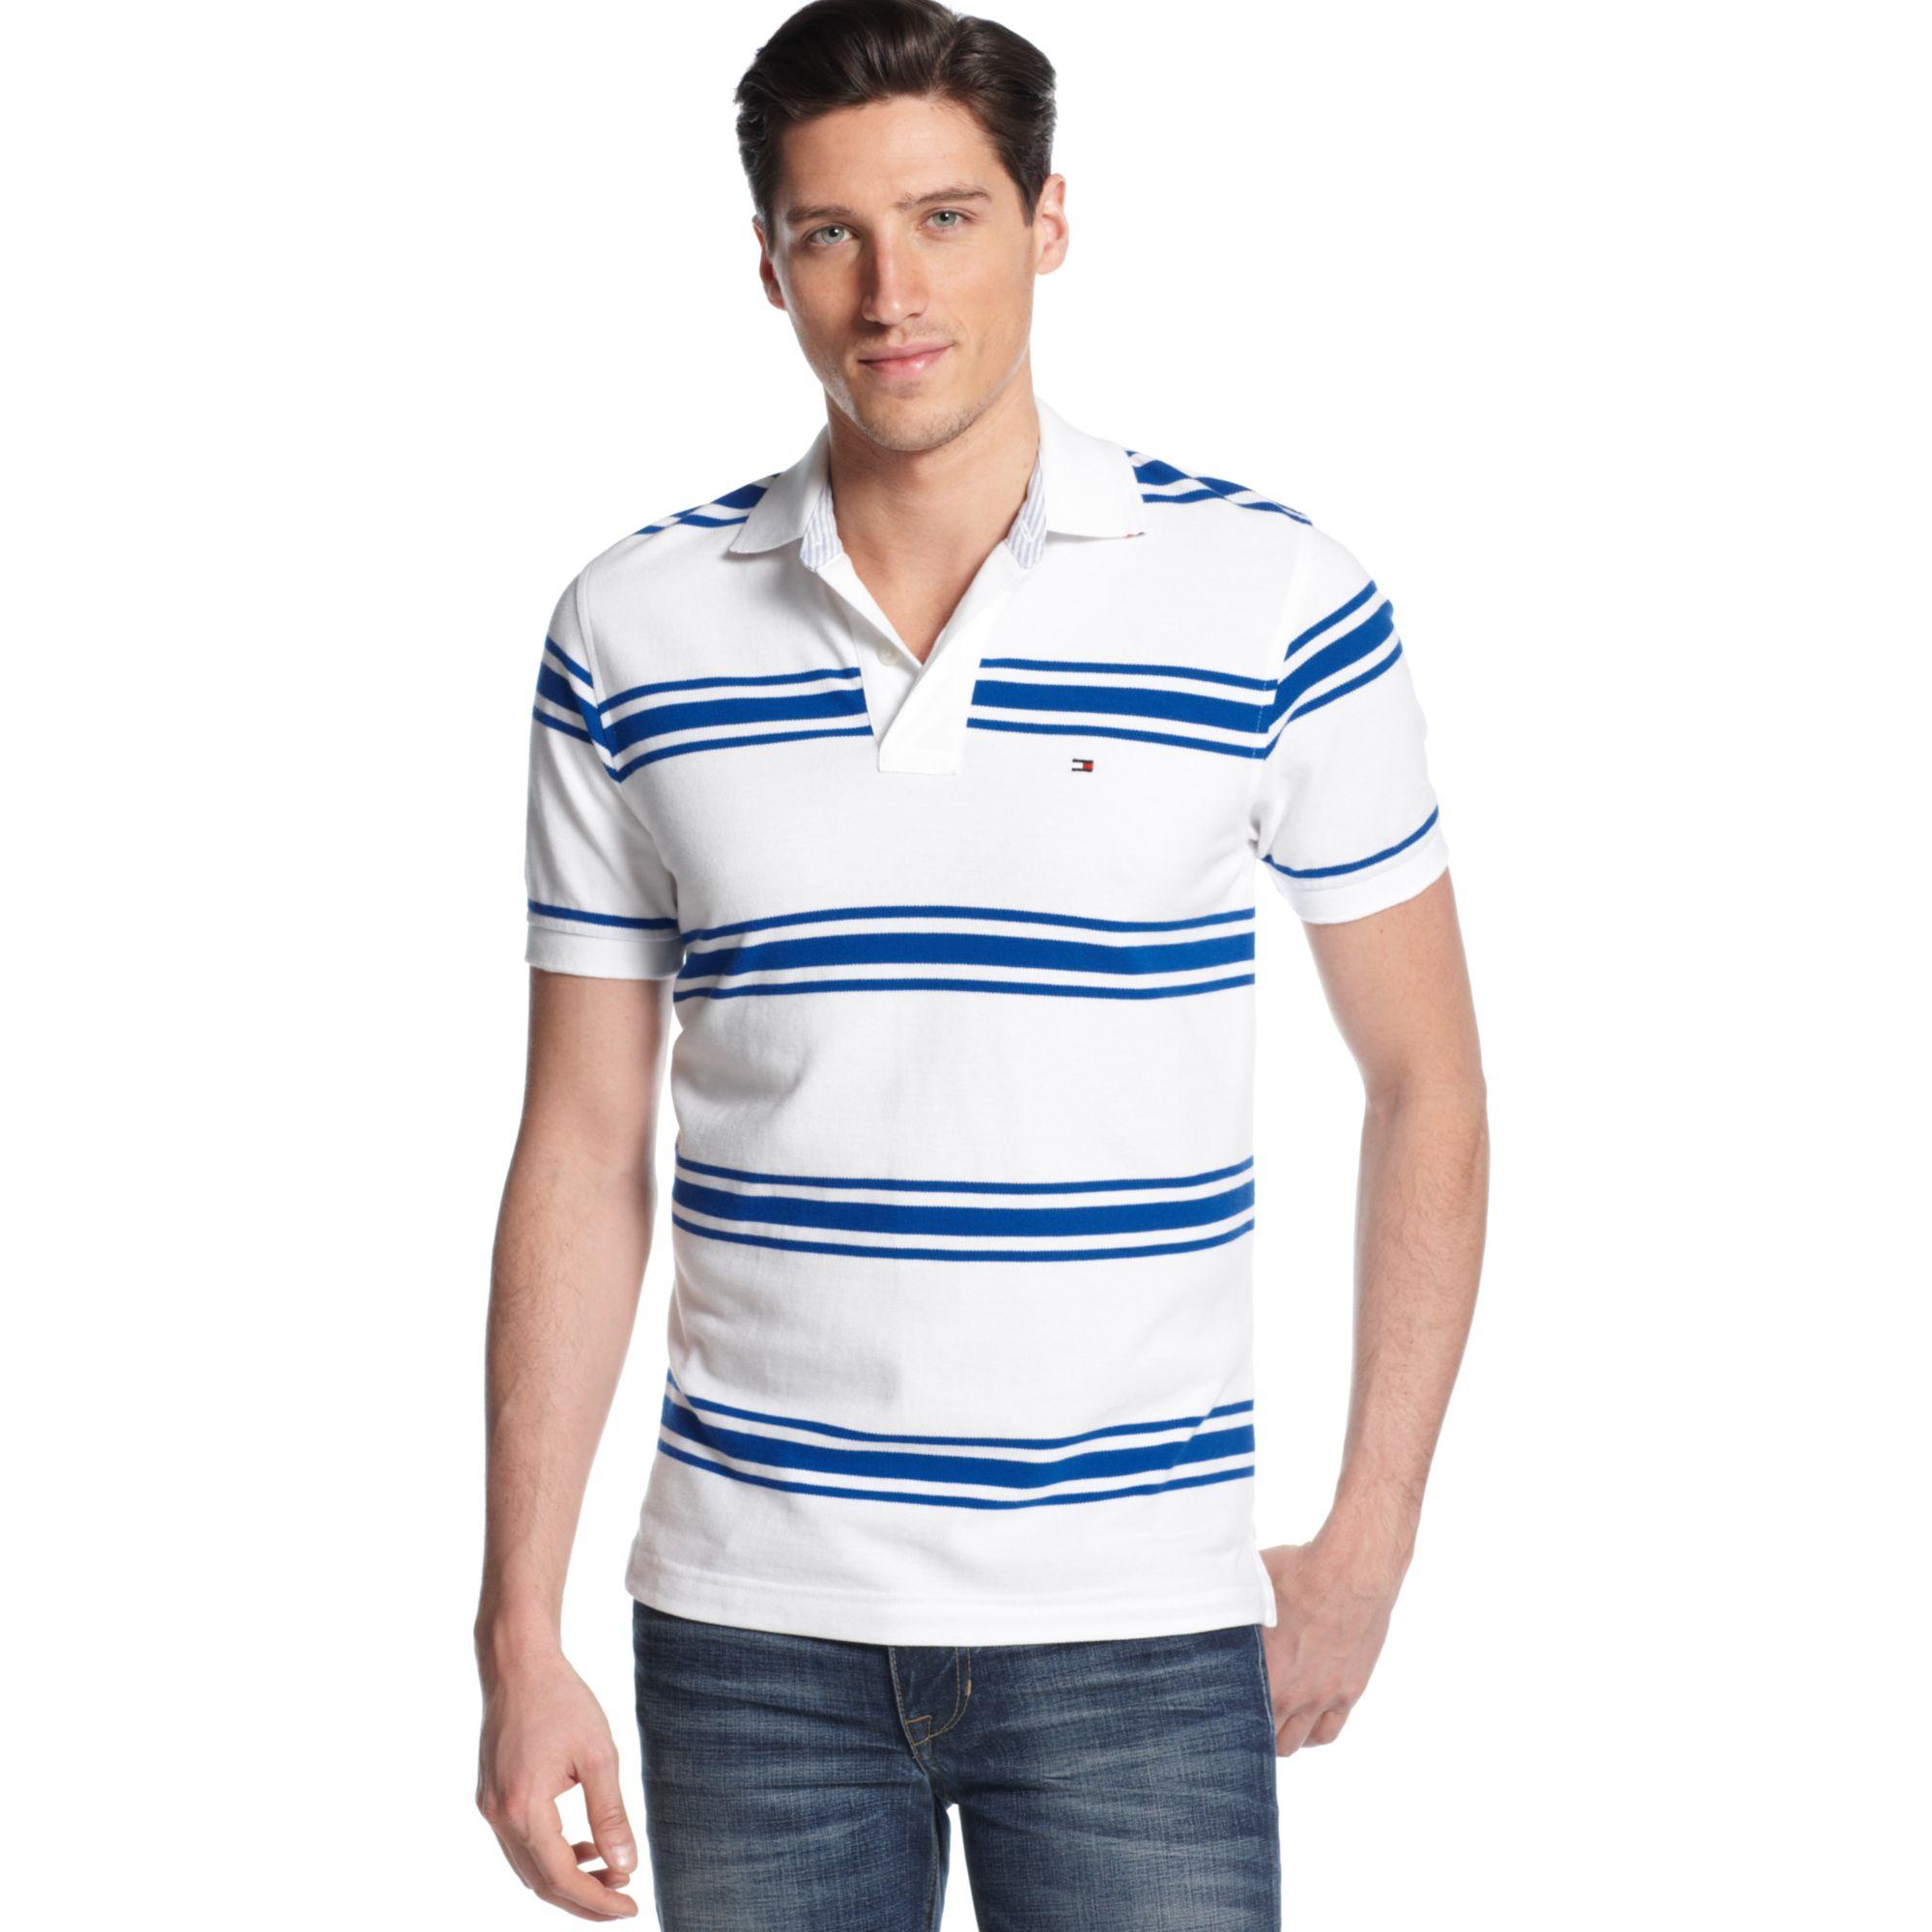 tommy hilfiger crosby striped polo shirt in blue for men. Black Bedroom Furniture Sets. Home Design Ideas